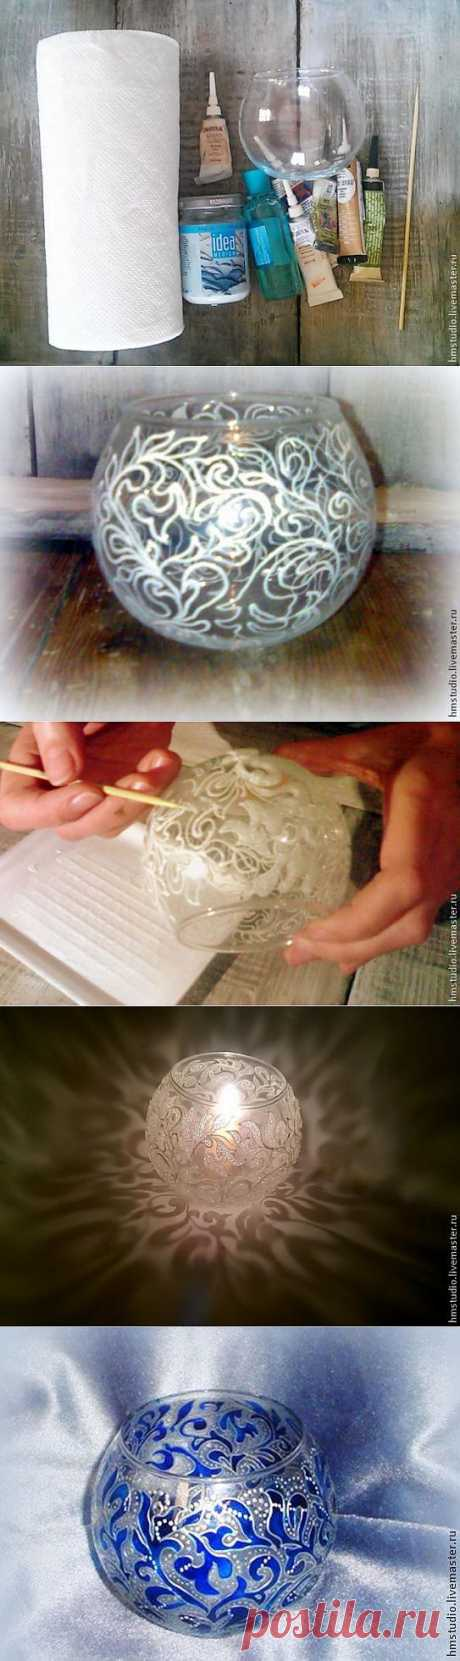 La cinta helada sobre el florero | Samodelkino